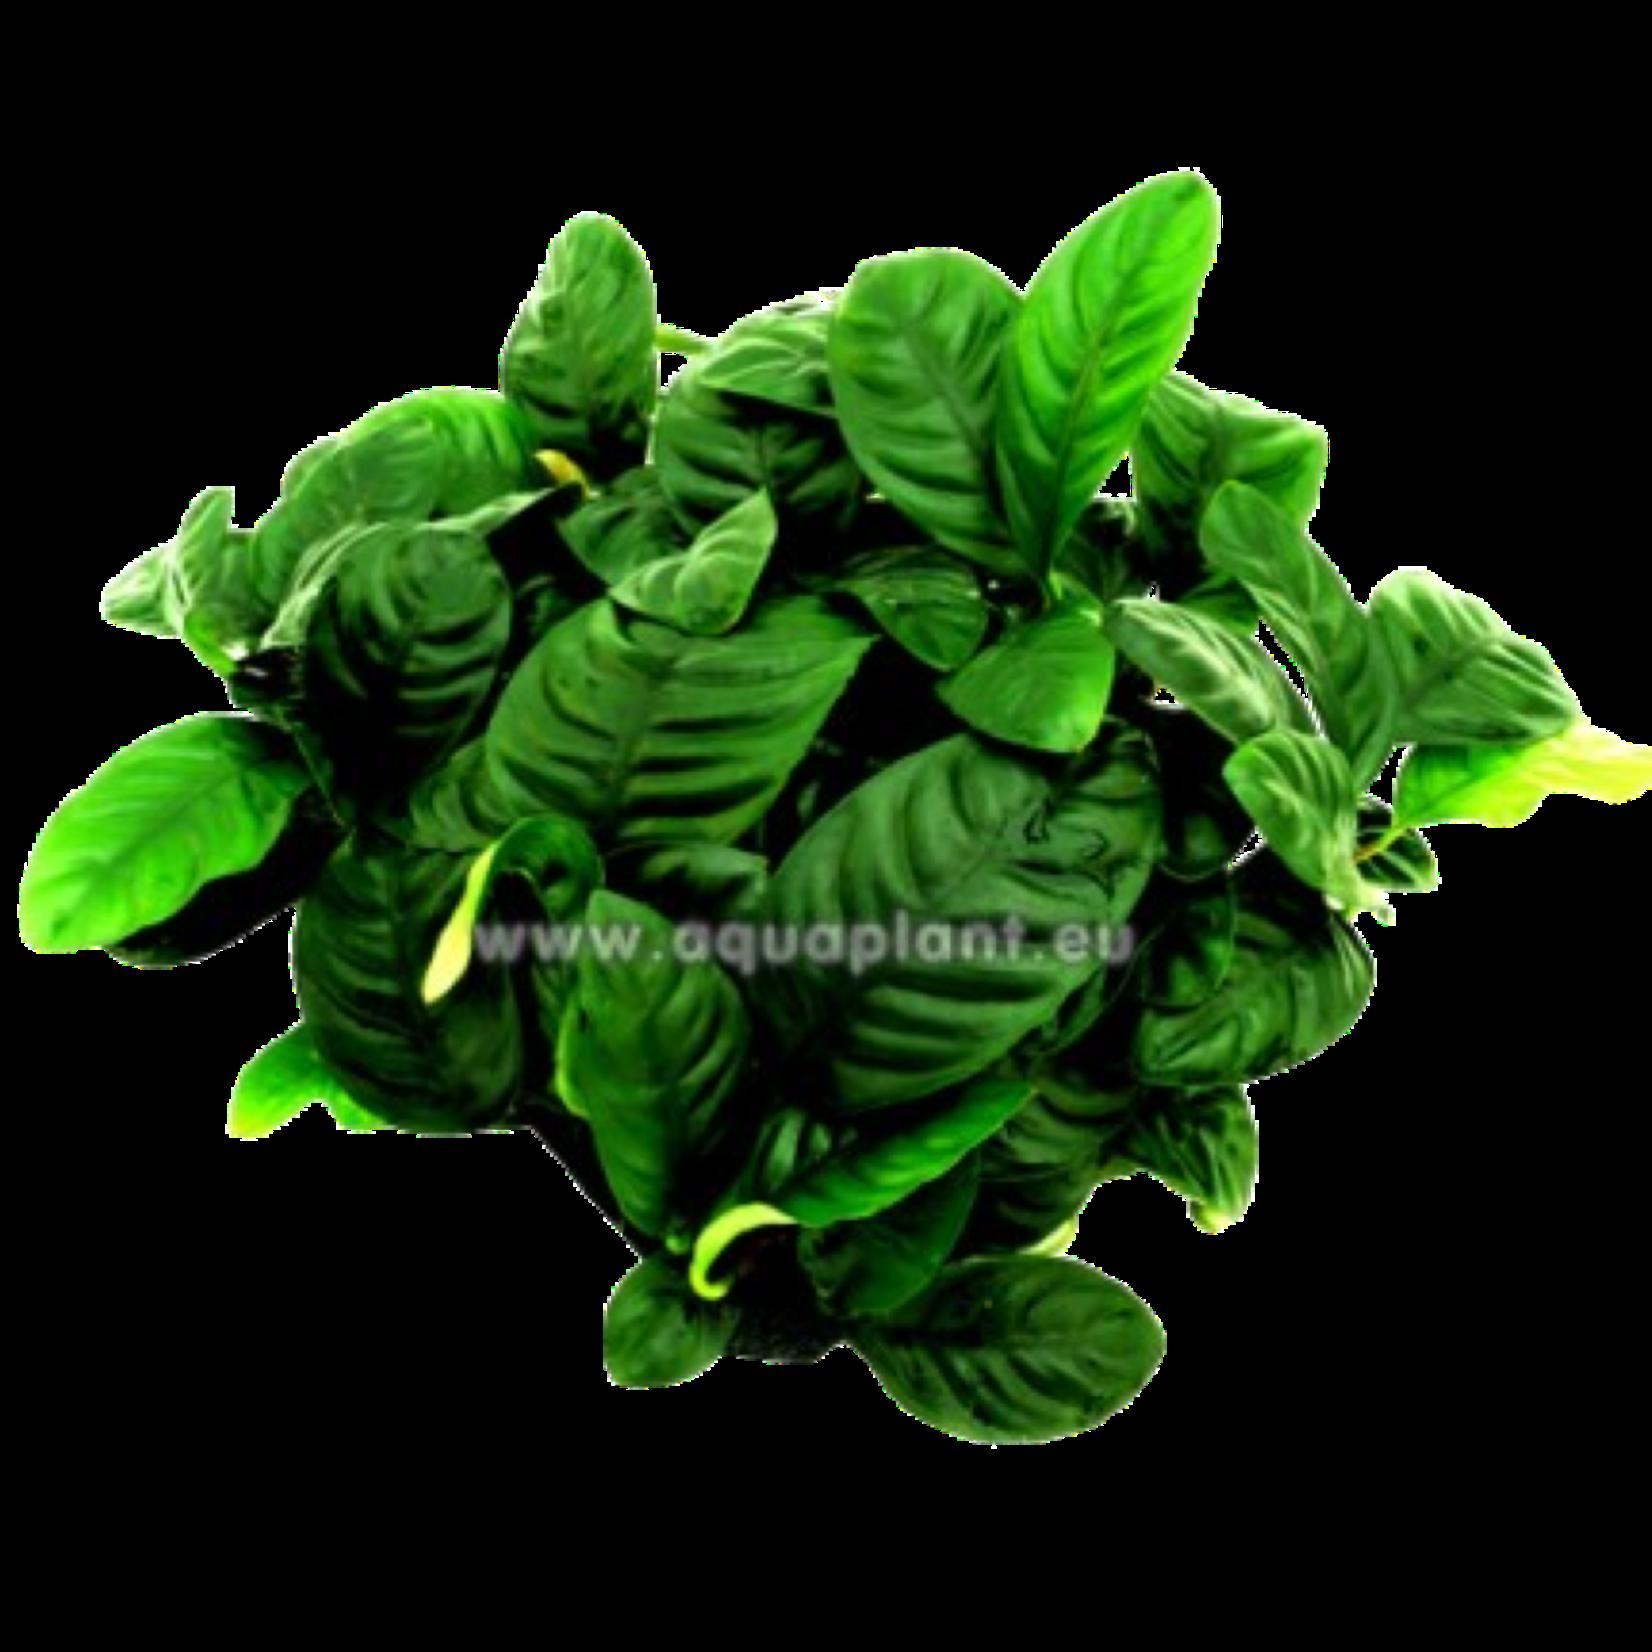 Epaqmat Coffeefolia - Groene muur 16.5x13cm